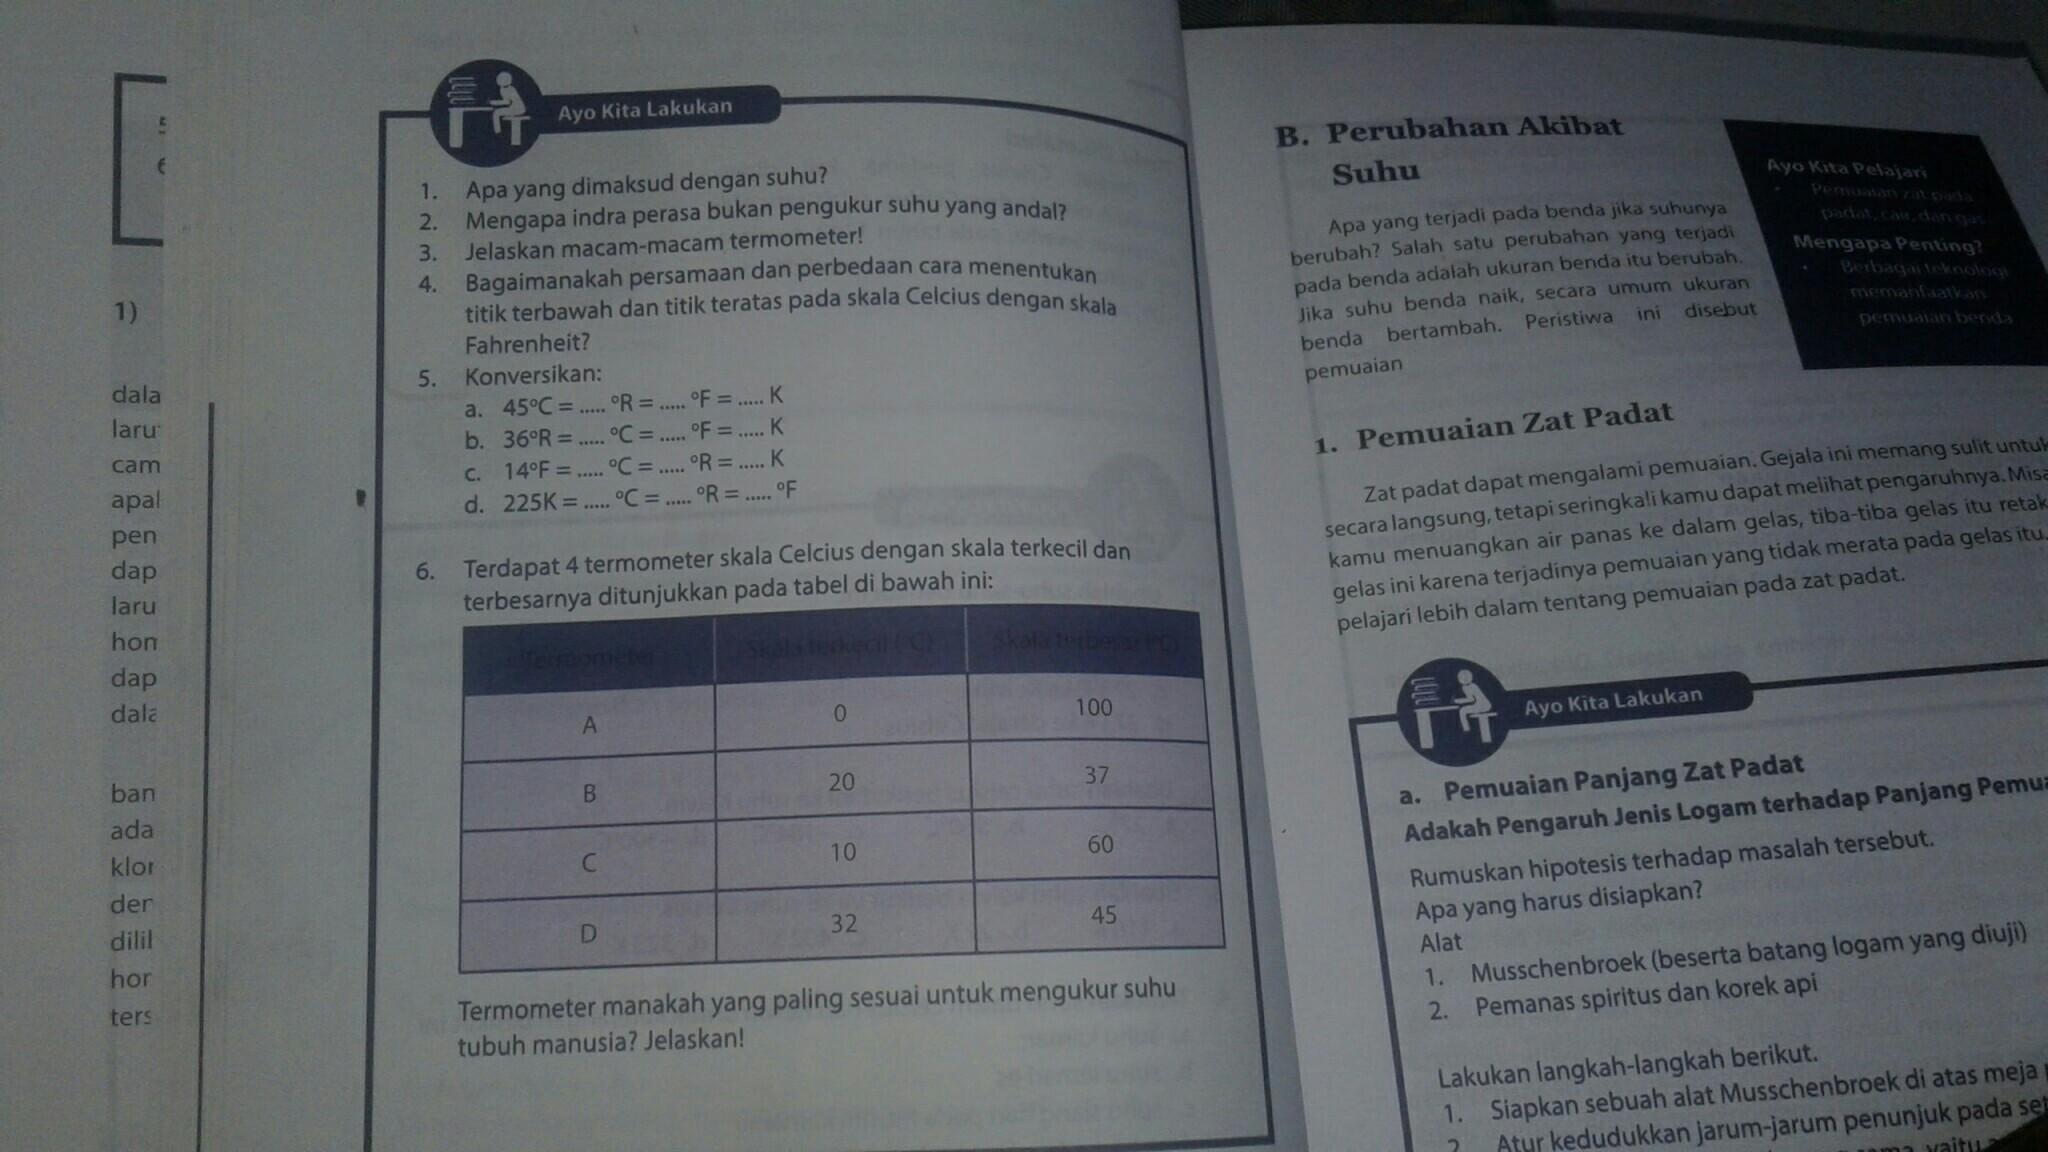 Ipa Halaman 144 145 Kelas 7 Tolong Dibantu Ya Besok Di Kumpulkan